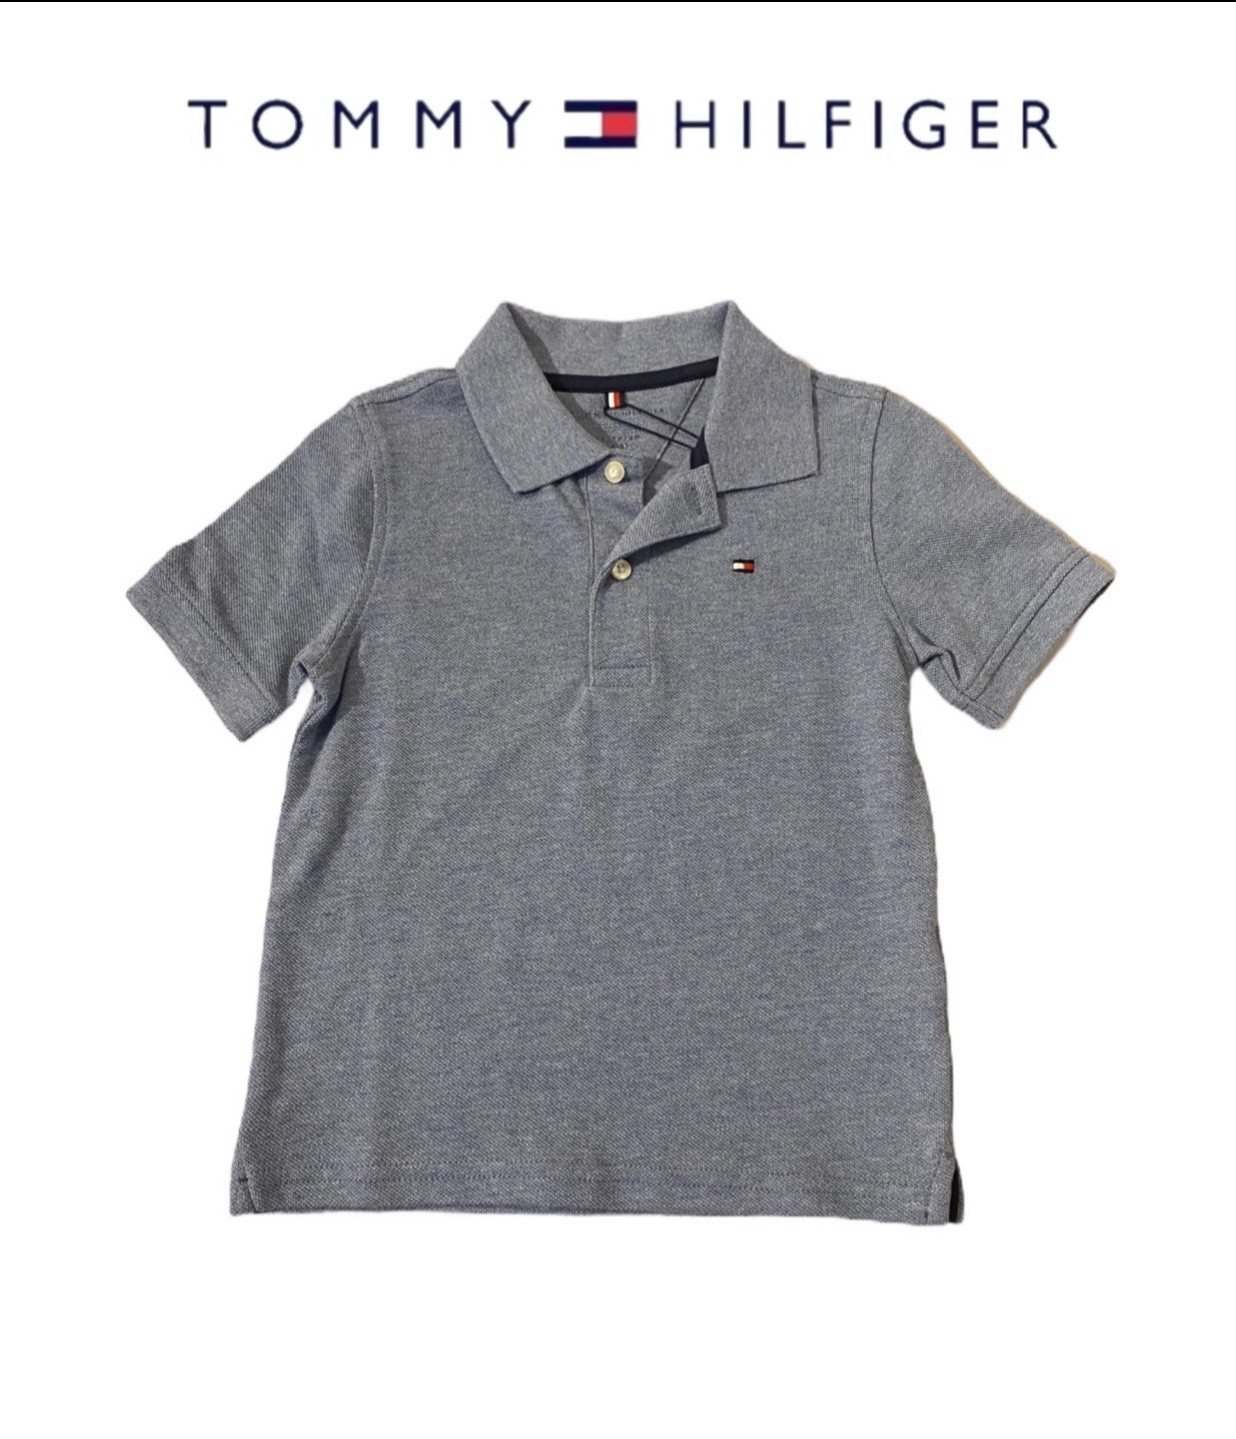 POLO TOMMY HILFIGER® AZUL MESCLADO